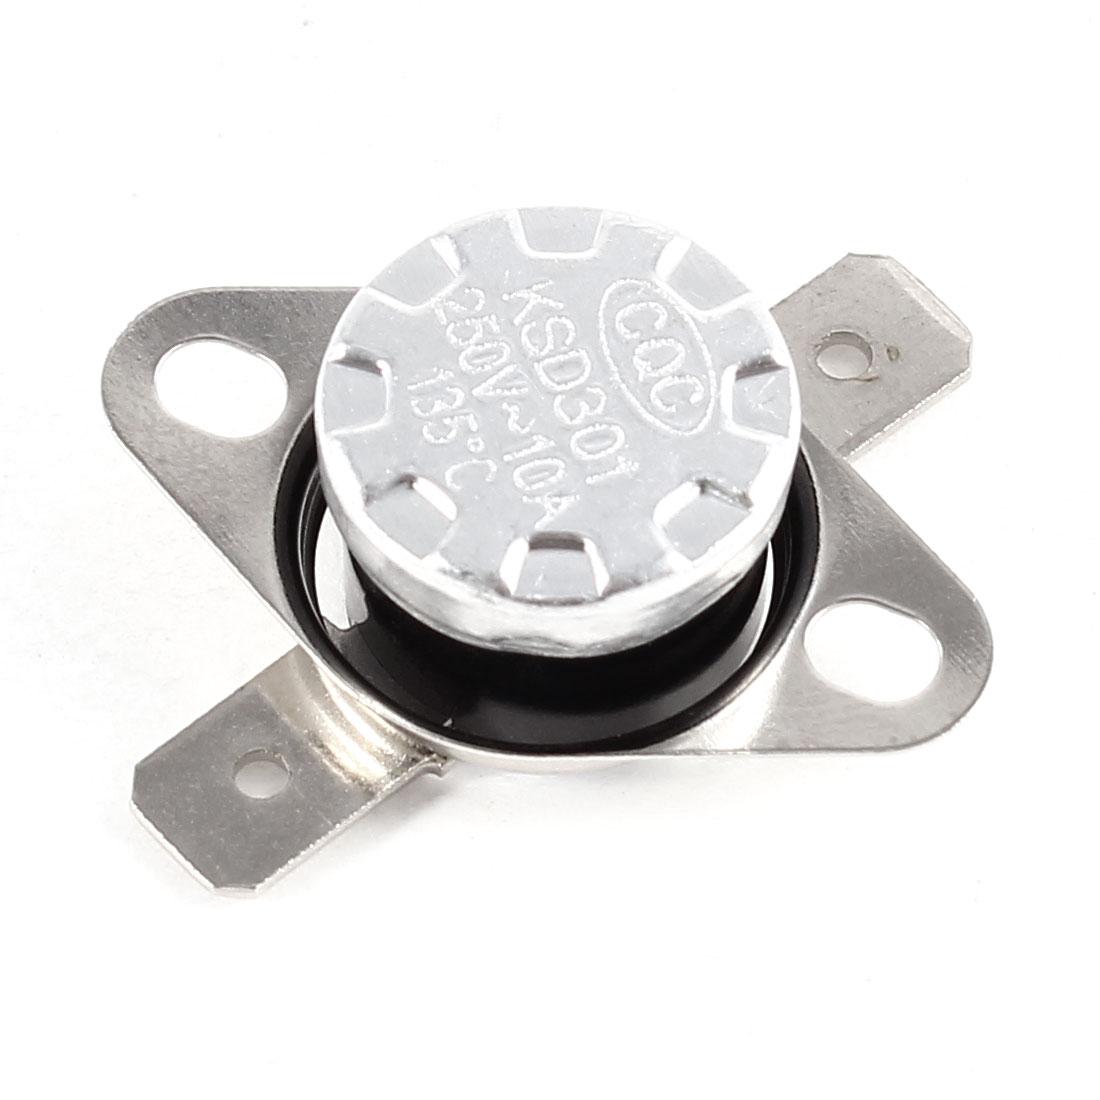 KSD301 AC 250V 10A 135C Celsius NC Temperature Control Switch Thermostat